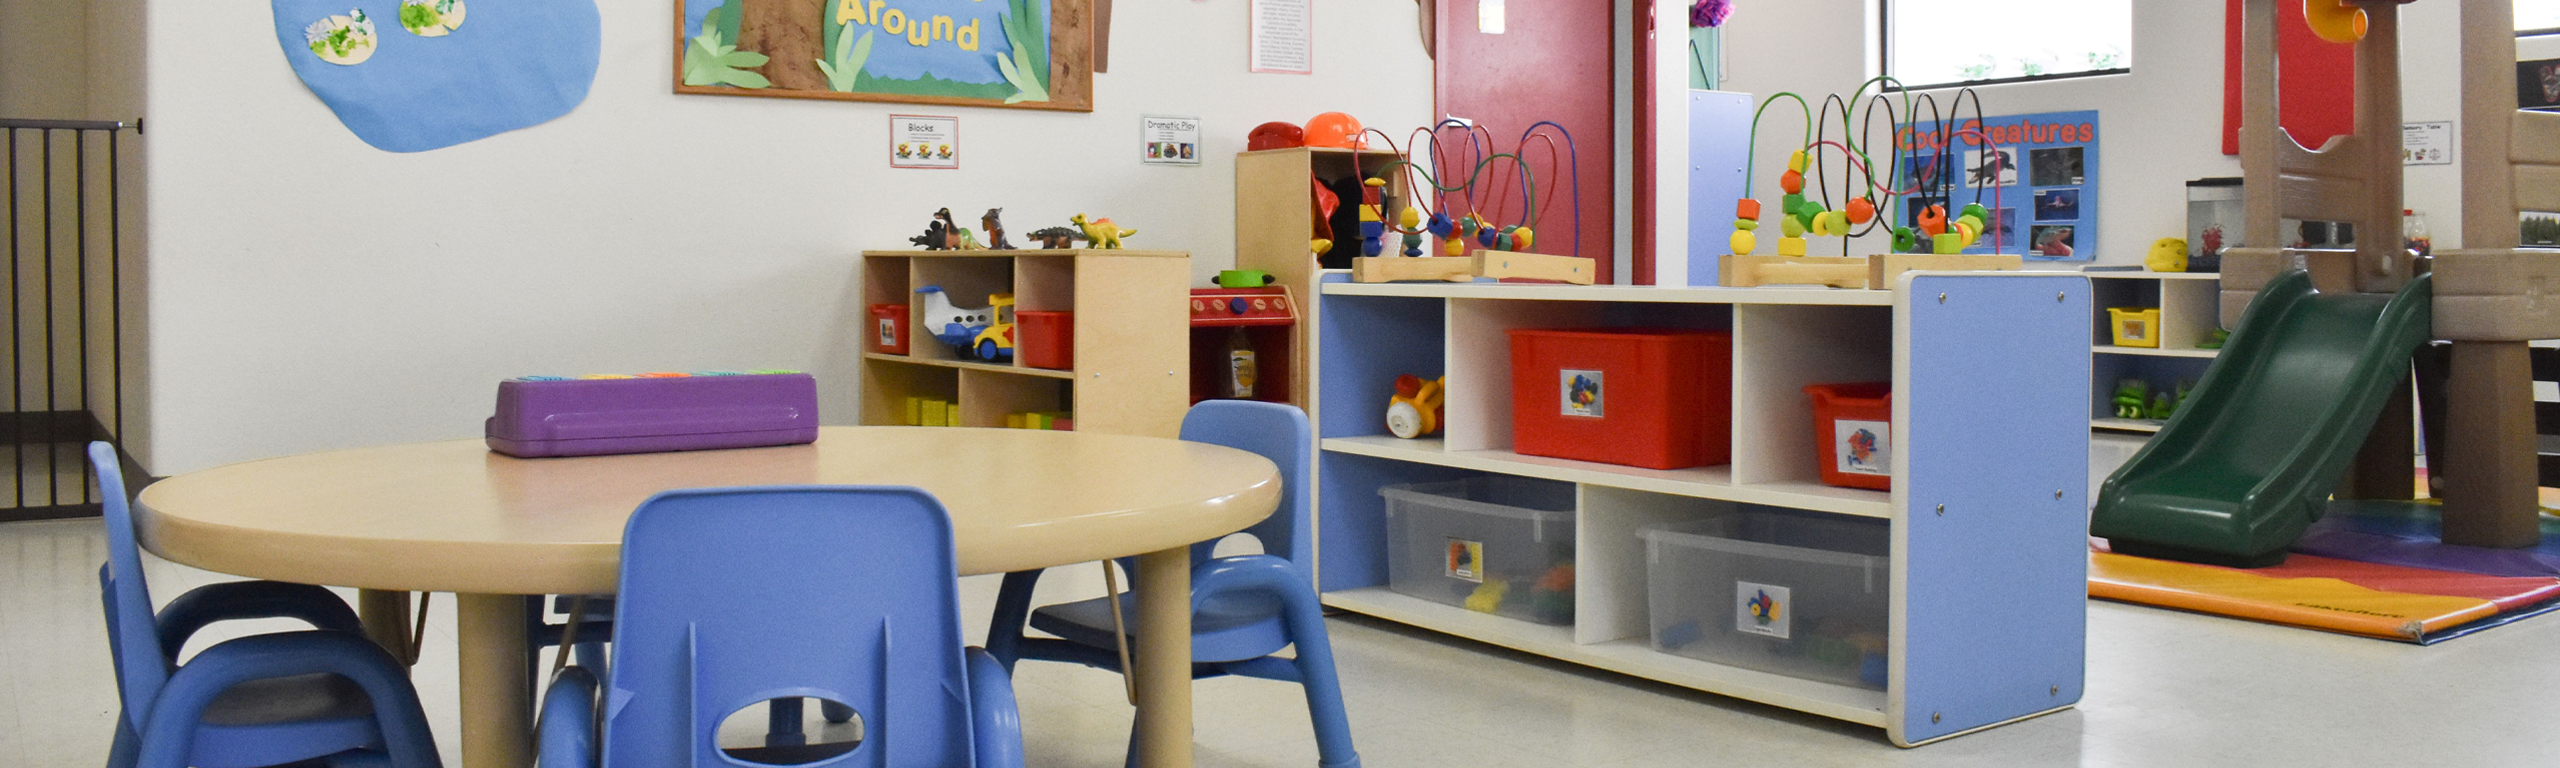 Daycare Preschool Maple Bear Tempe Az